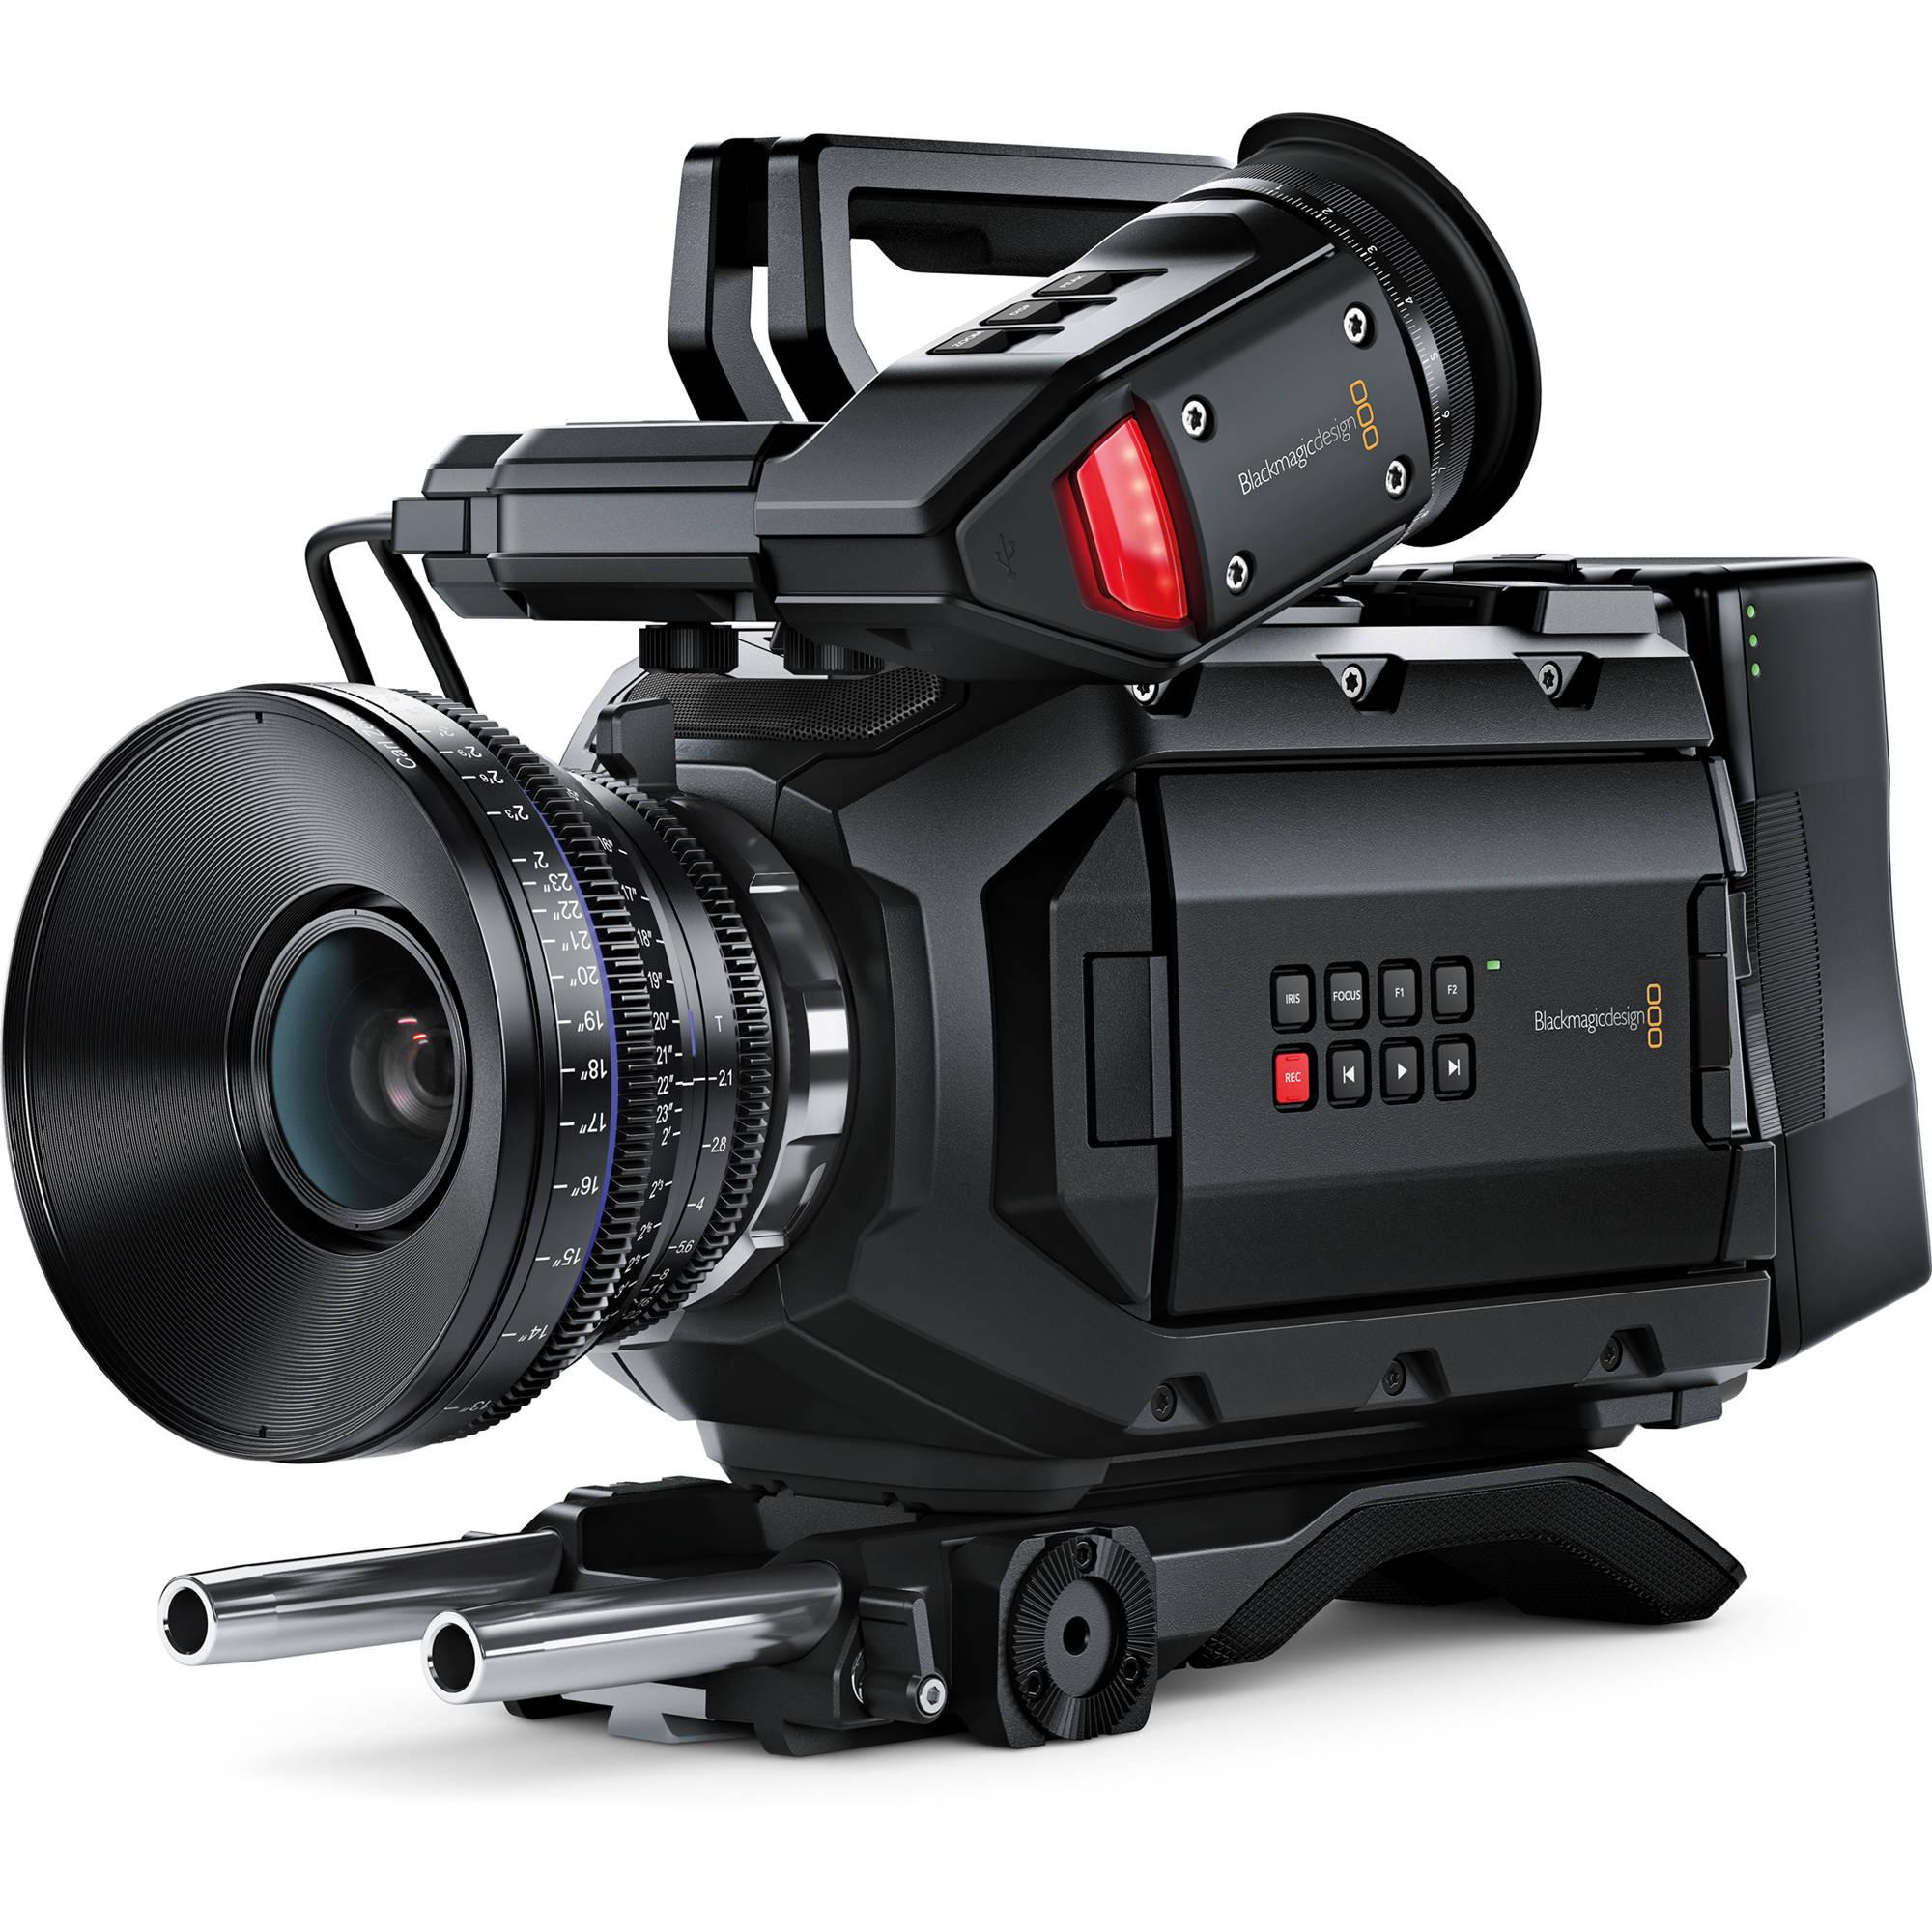 Blackmagic Design URSA Mini 4K Digital Cinema CINEURSAM40K/PL